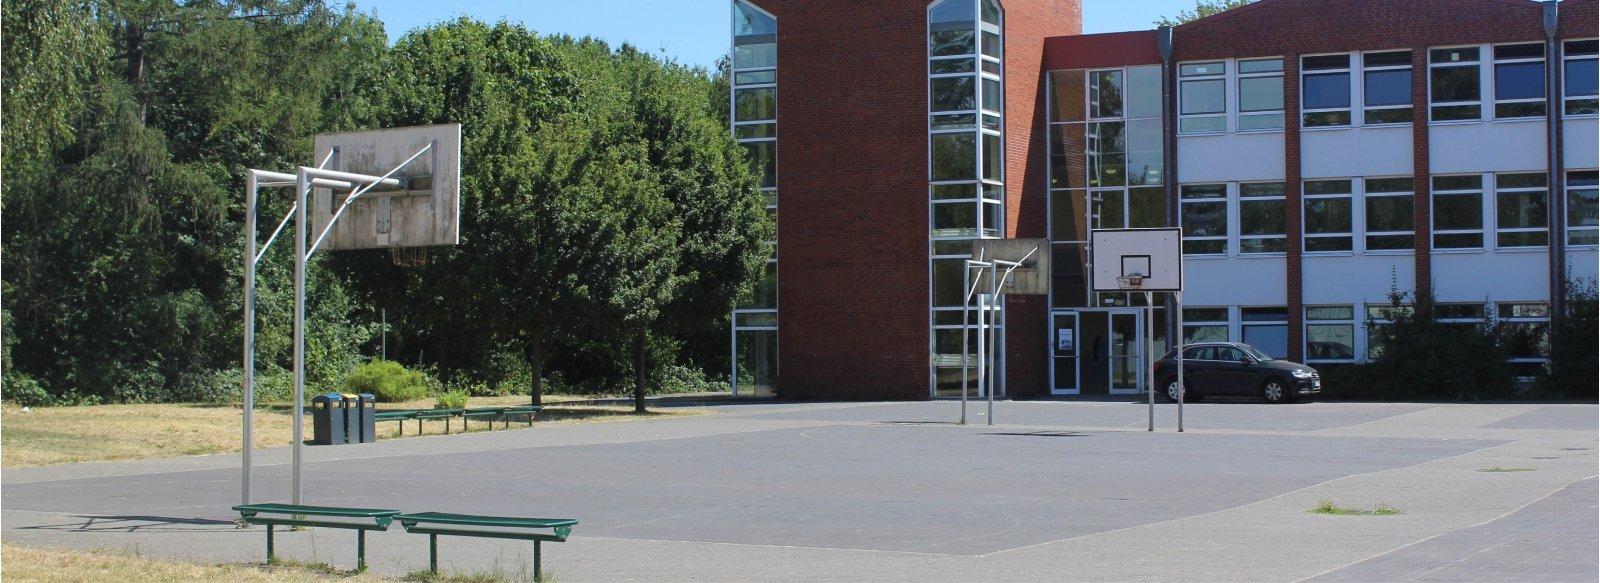 Gesamtschule In Köln